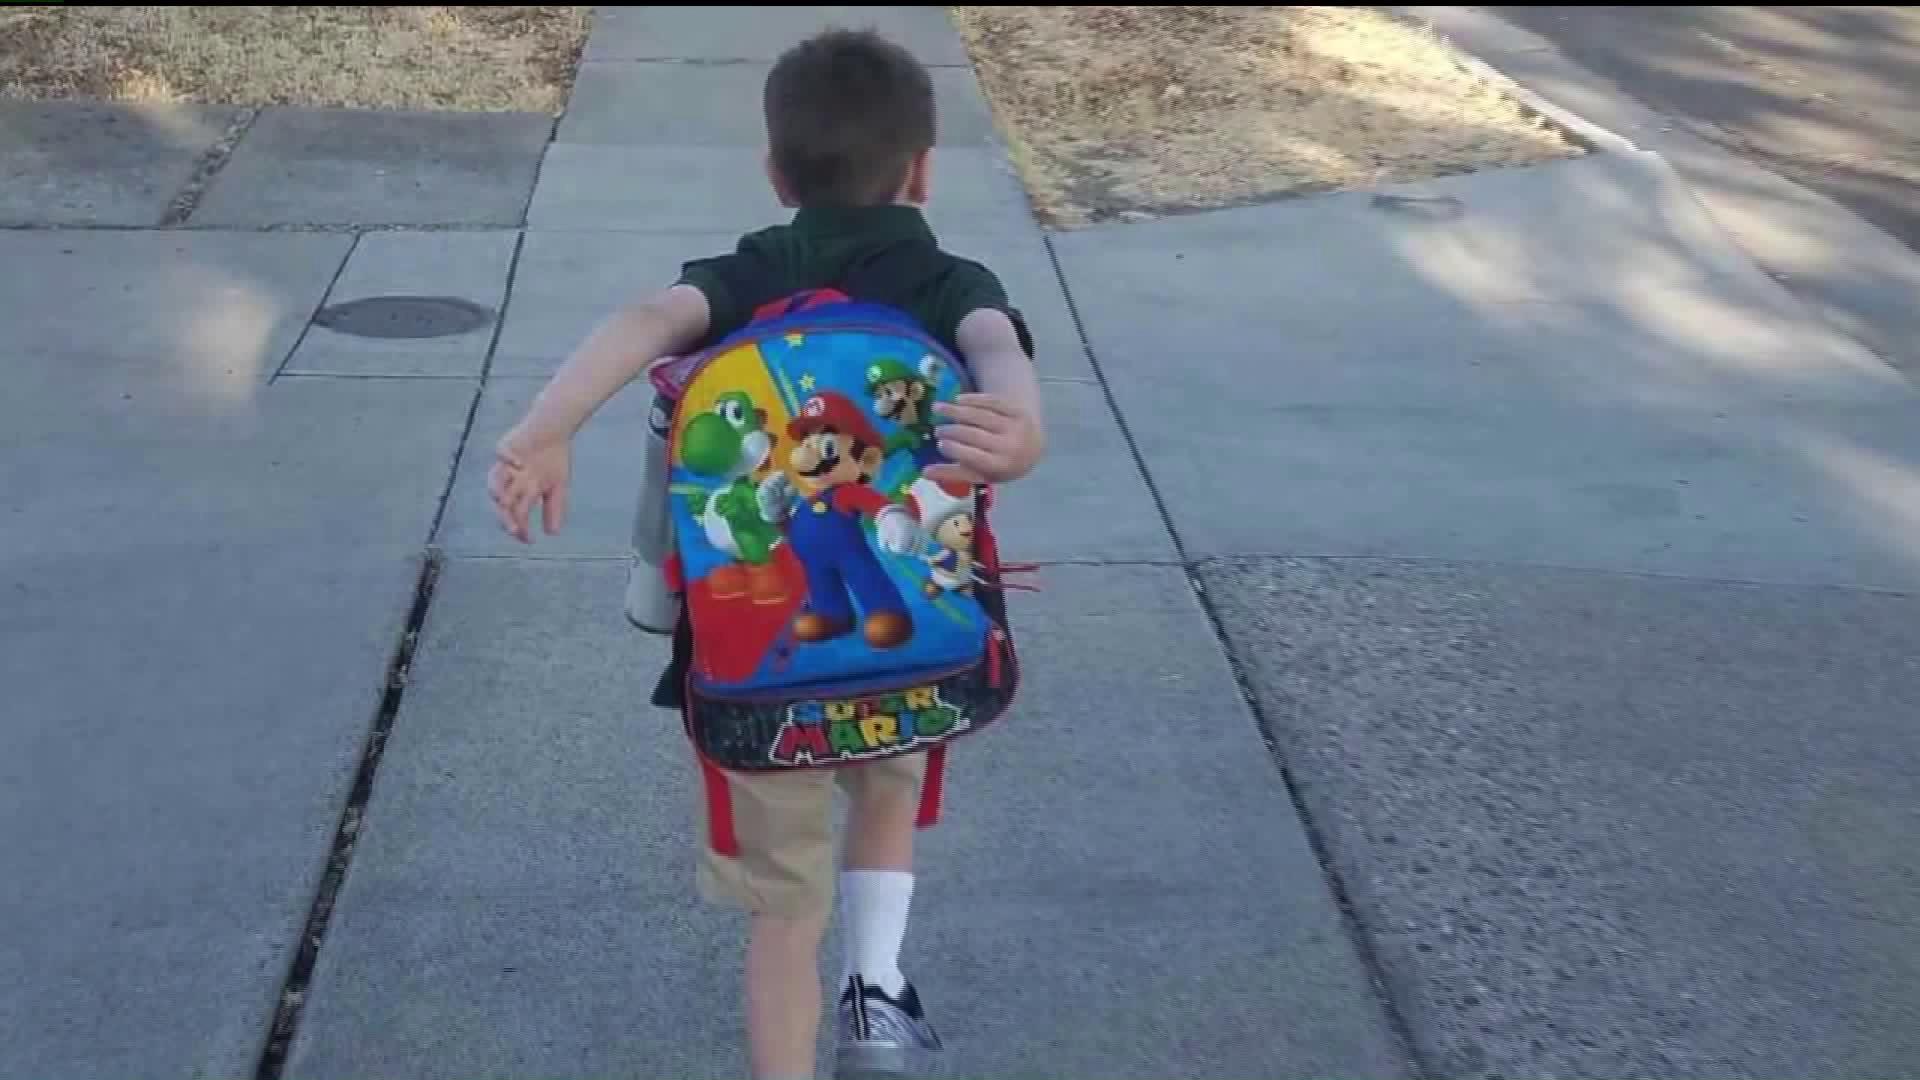 Kindergartener Suspended From School For Allegedly Making Terroristic Threat